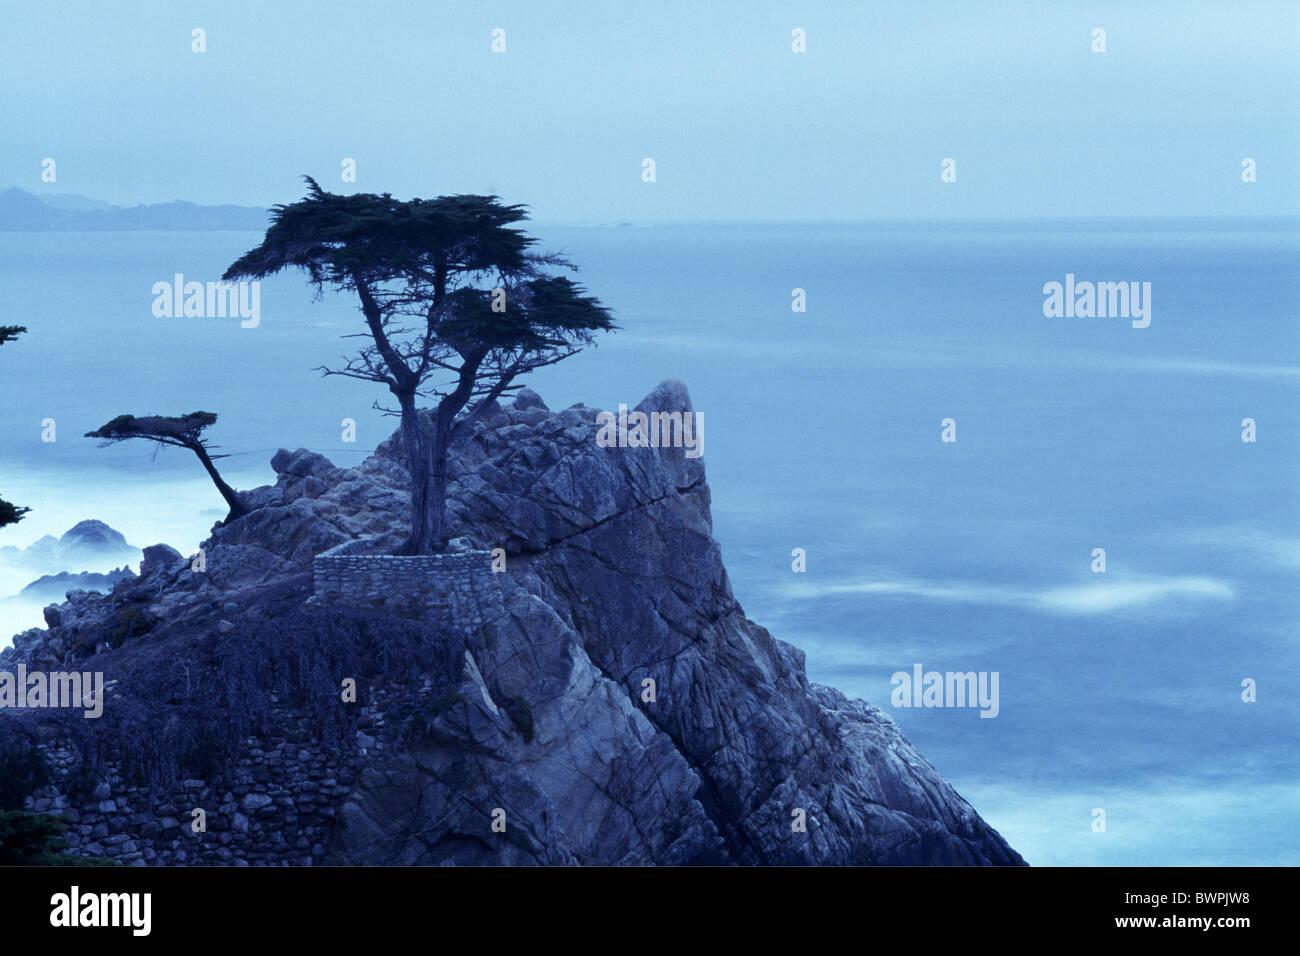 USA America United States North America 17 Mile Drive Highway 1 America California coast calendar landscape - Stock Image